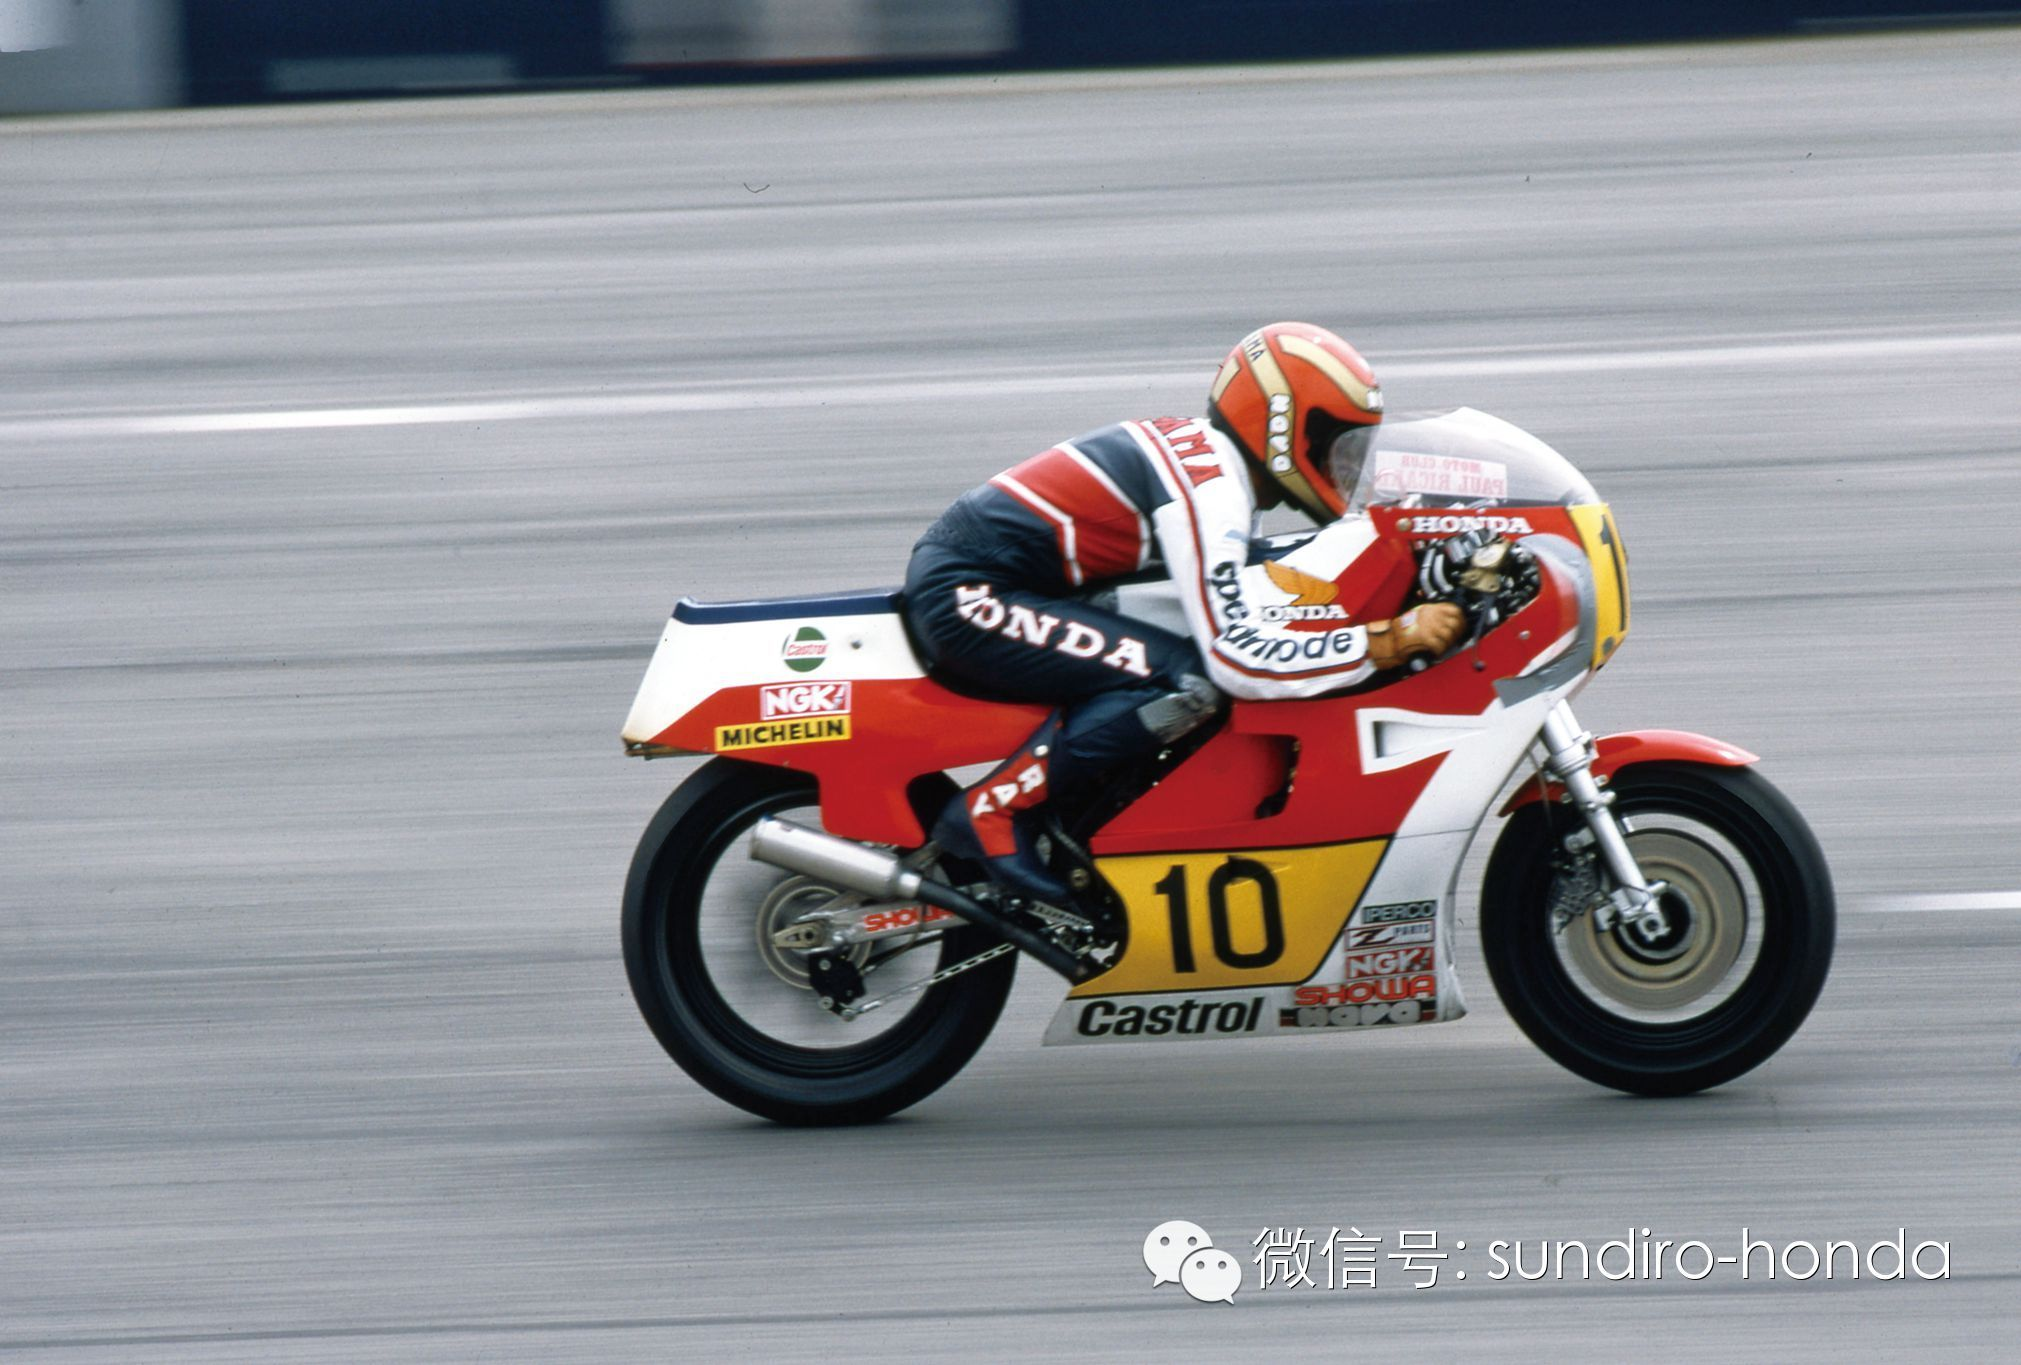 Honda Racing Moto Gp: Moto GP, Grand Prix, WSBK, TT